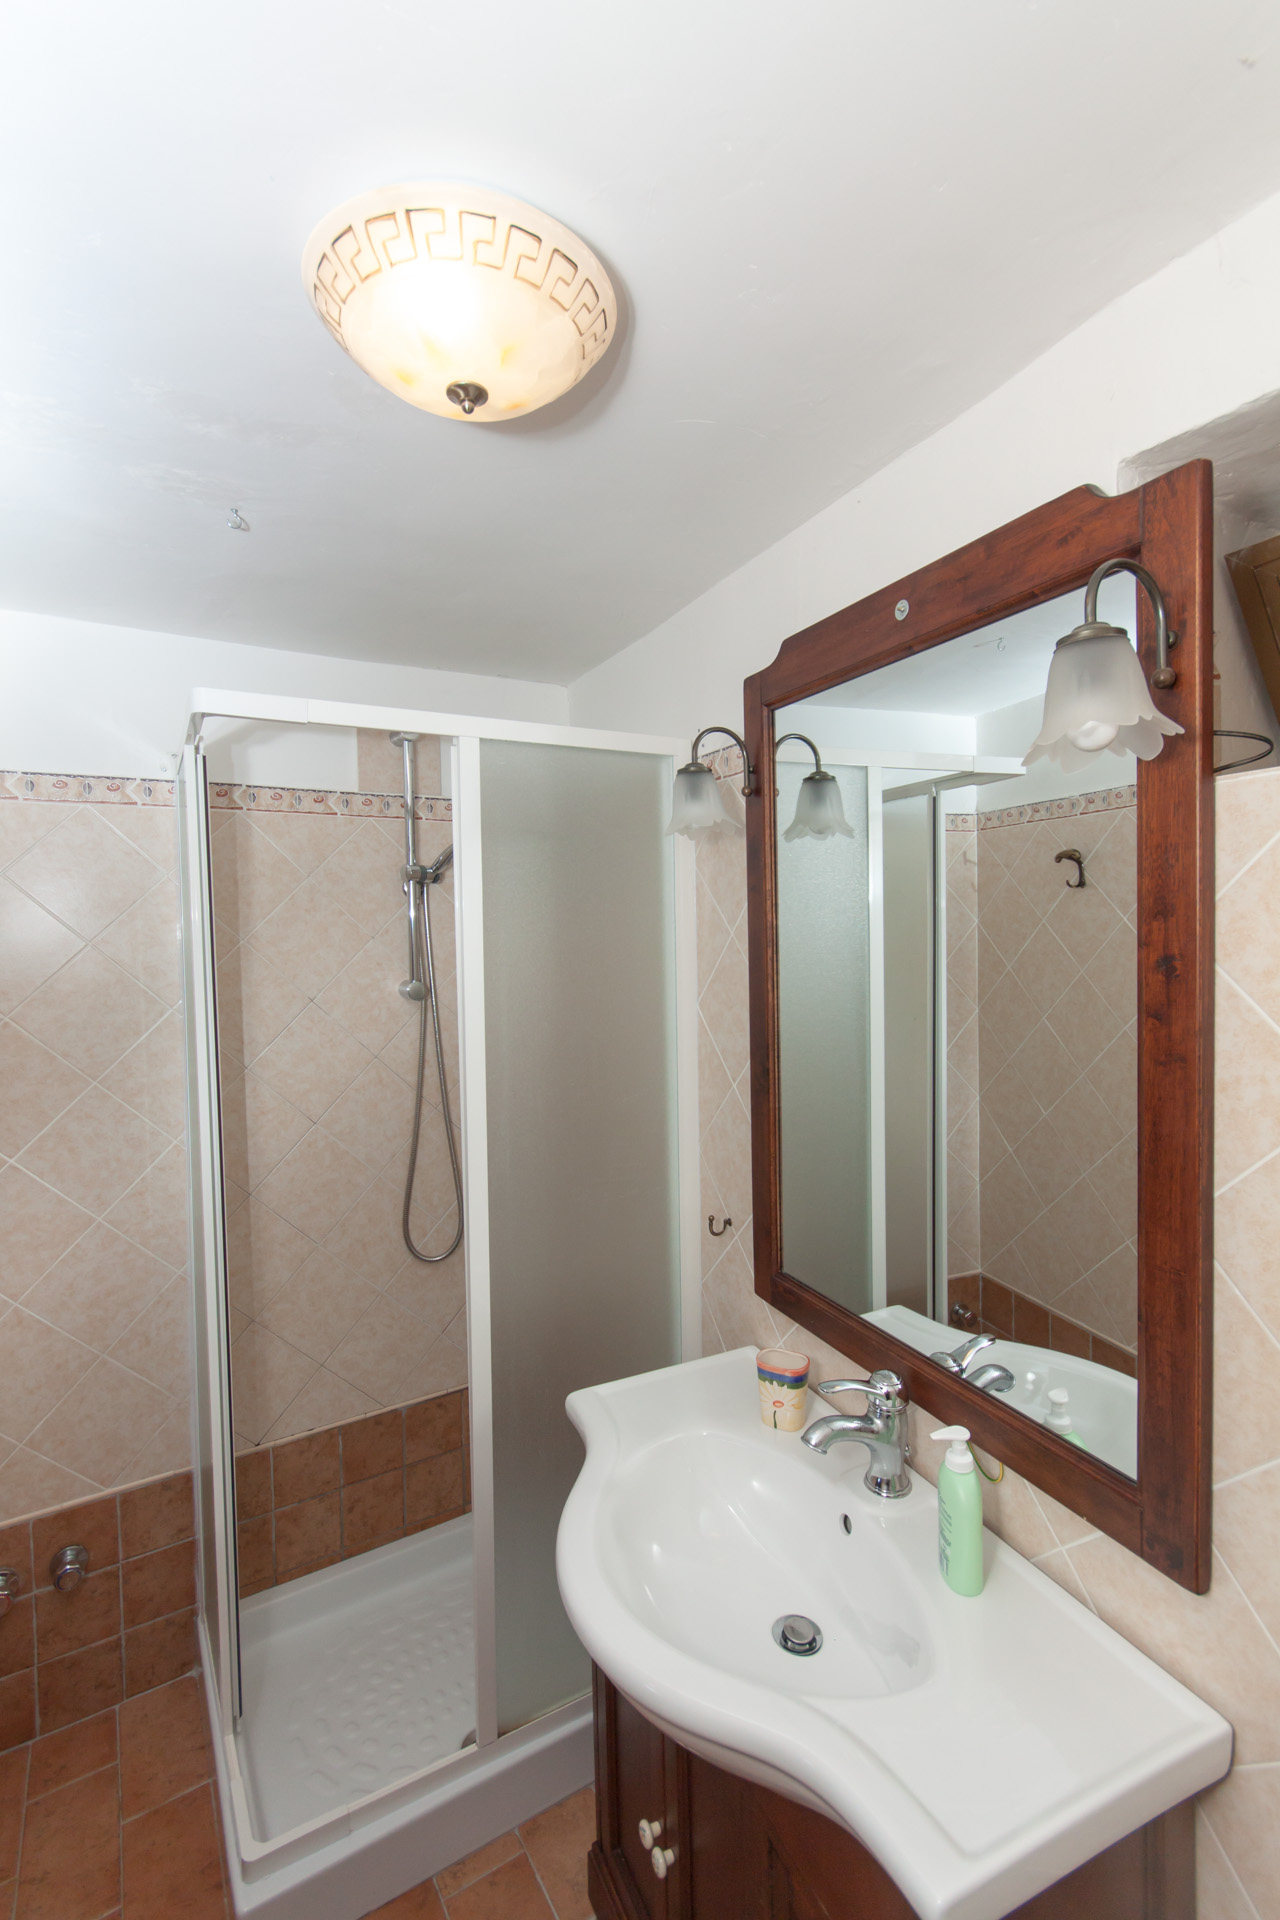 http://www.bebilborgo.com/sito/uploads/2014/07/appartamento-scapoli-zia-carmelina-IMG_9615.jpg